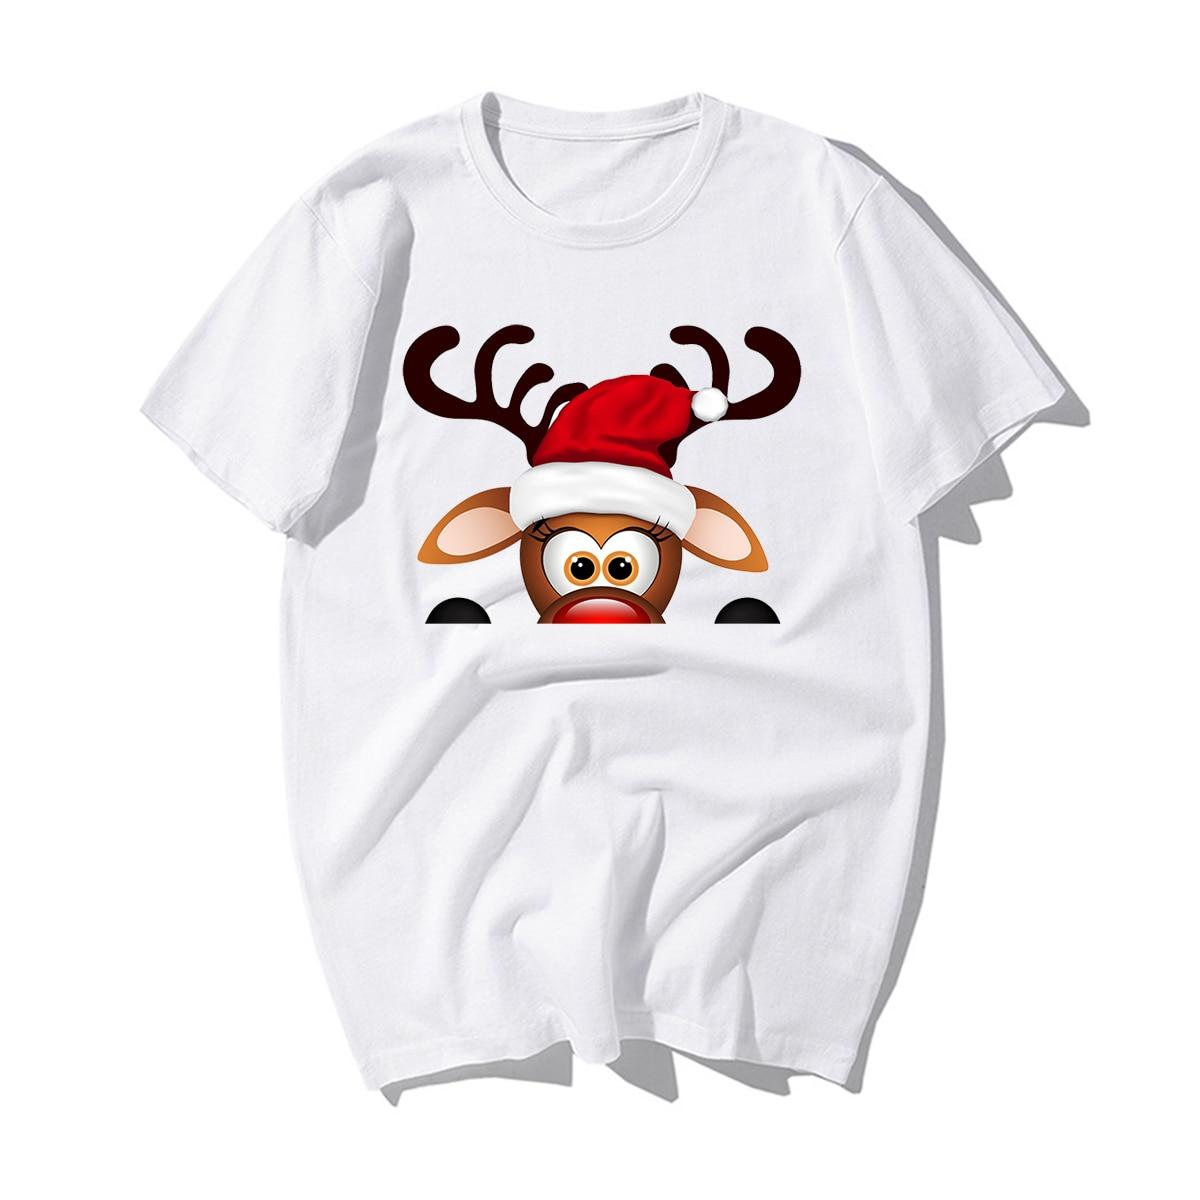 Funny Merry Christmas T-shirts Men New Casual Cotton Reindeer Santa Claus Christmas Tree Tshirt Mens Xmas Happy New Year Gift